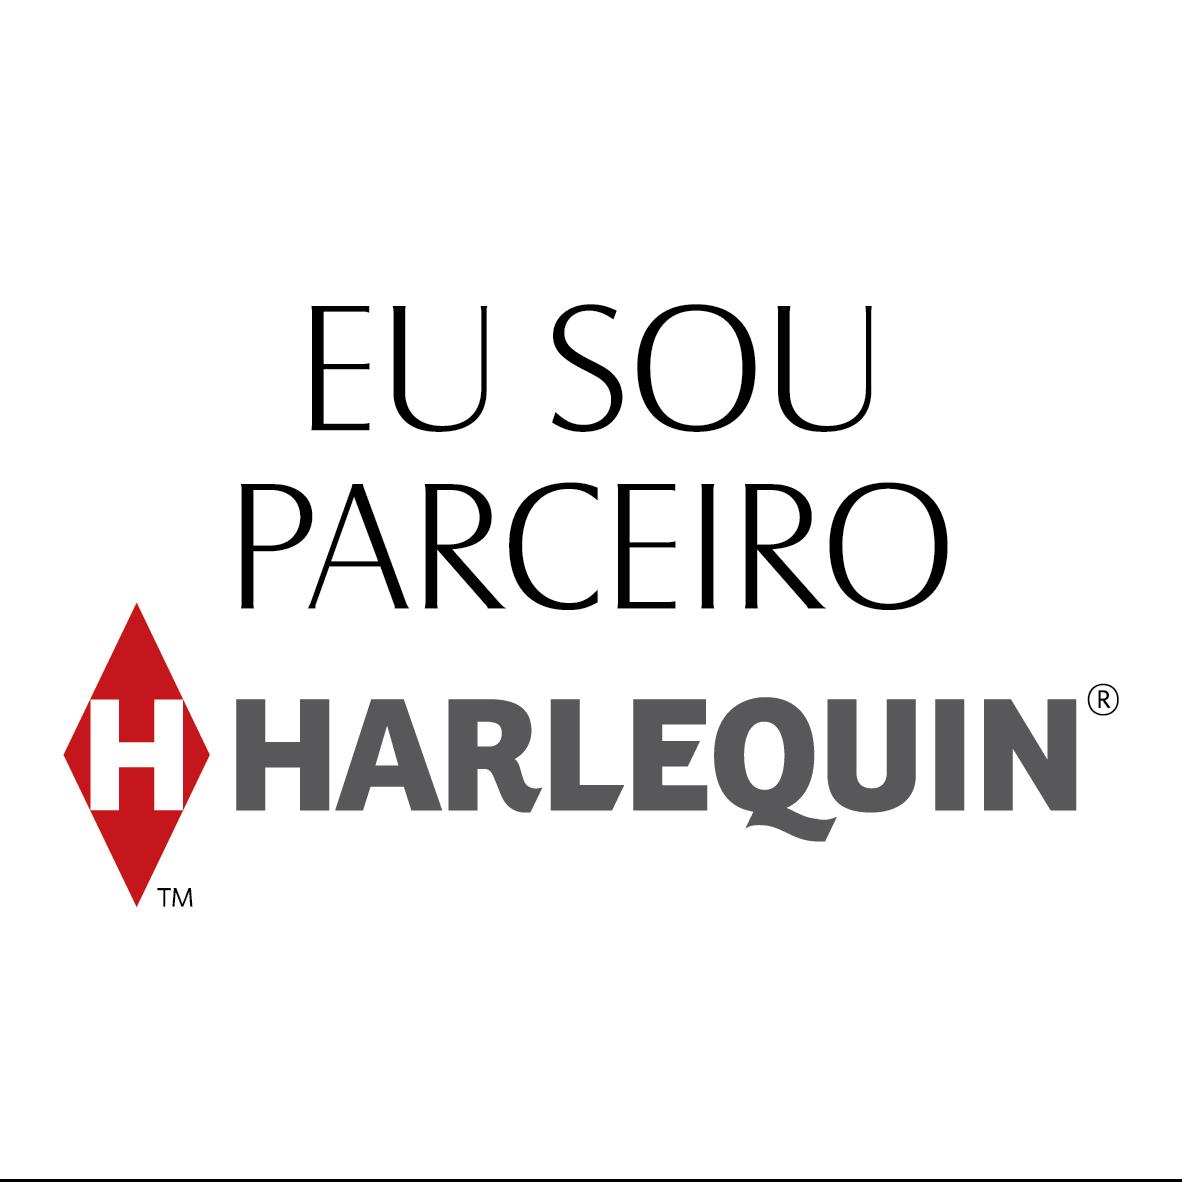 EDITORA HARLEQUIN